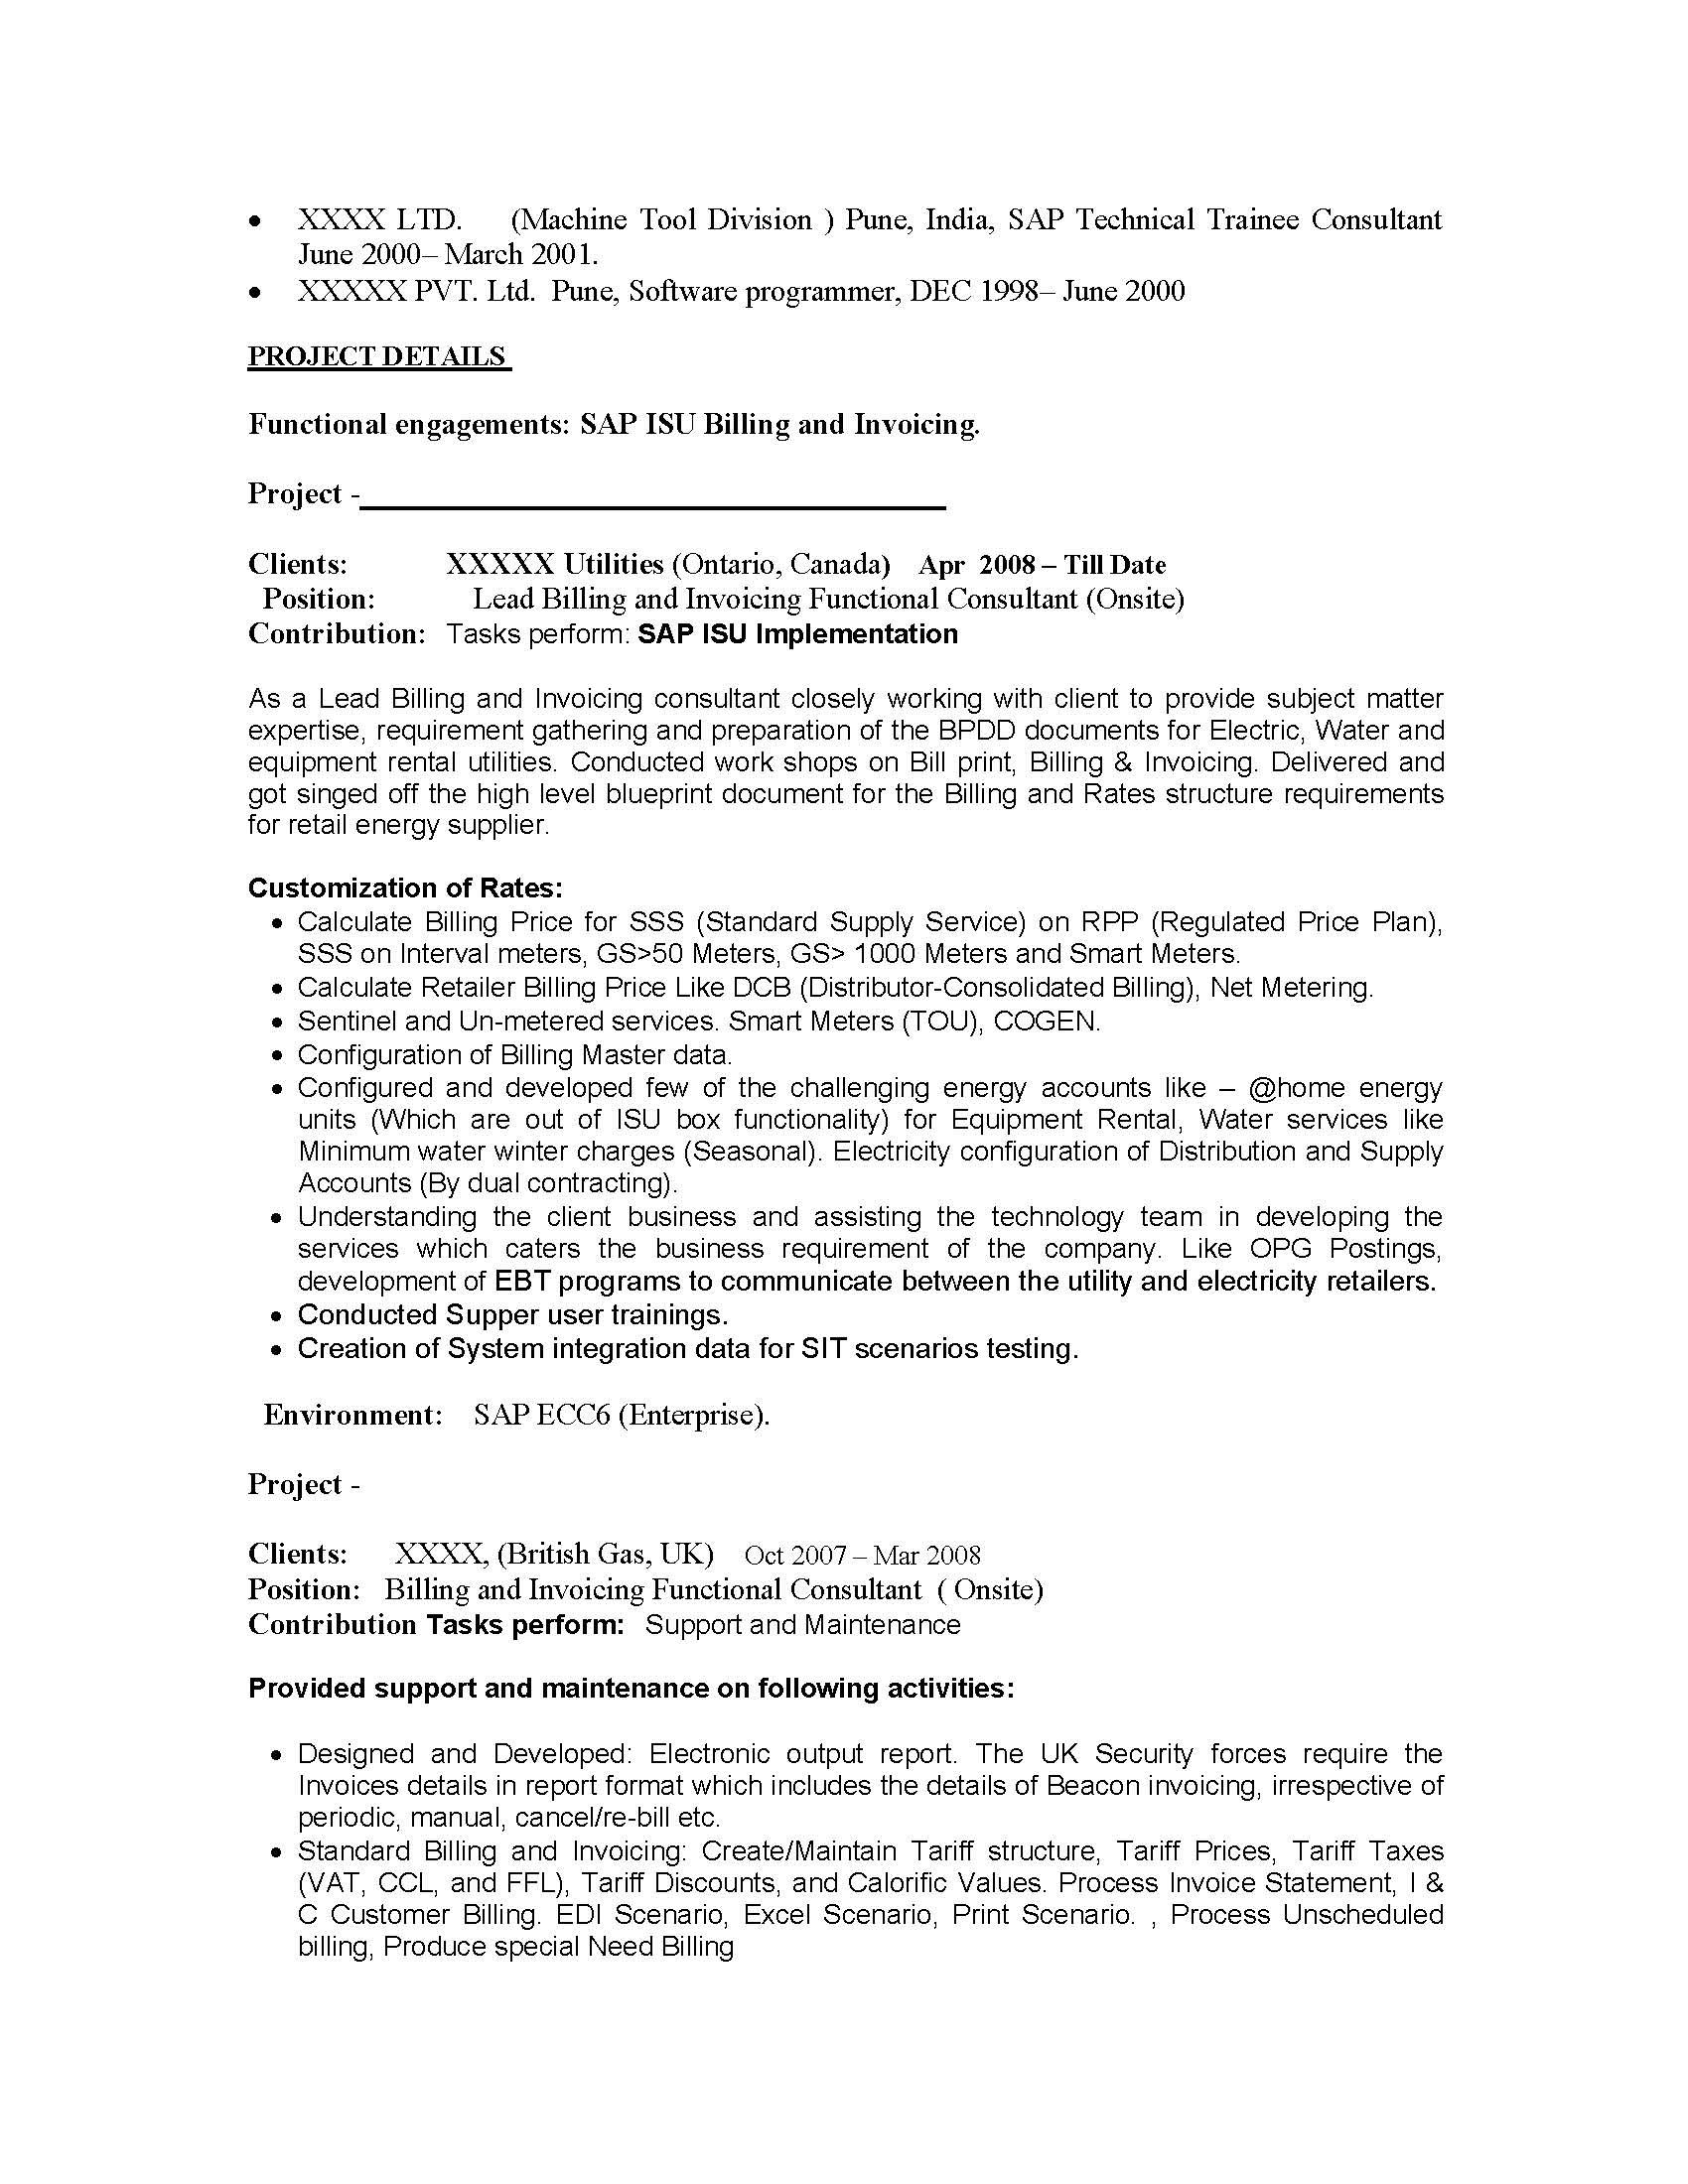 Sap Pp Consultant Resume Sample | Post Internship Thank You Letter ...